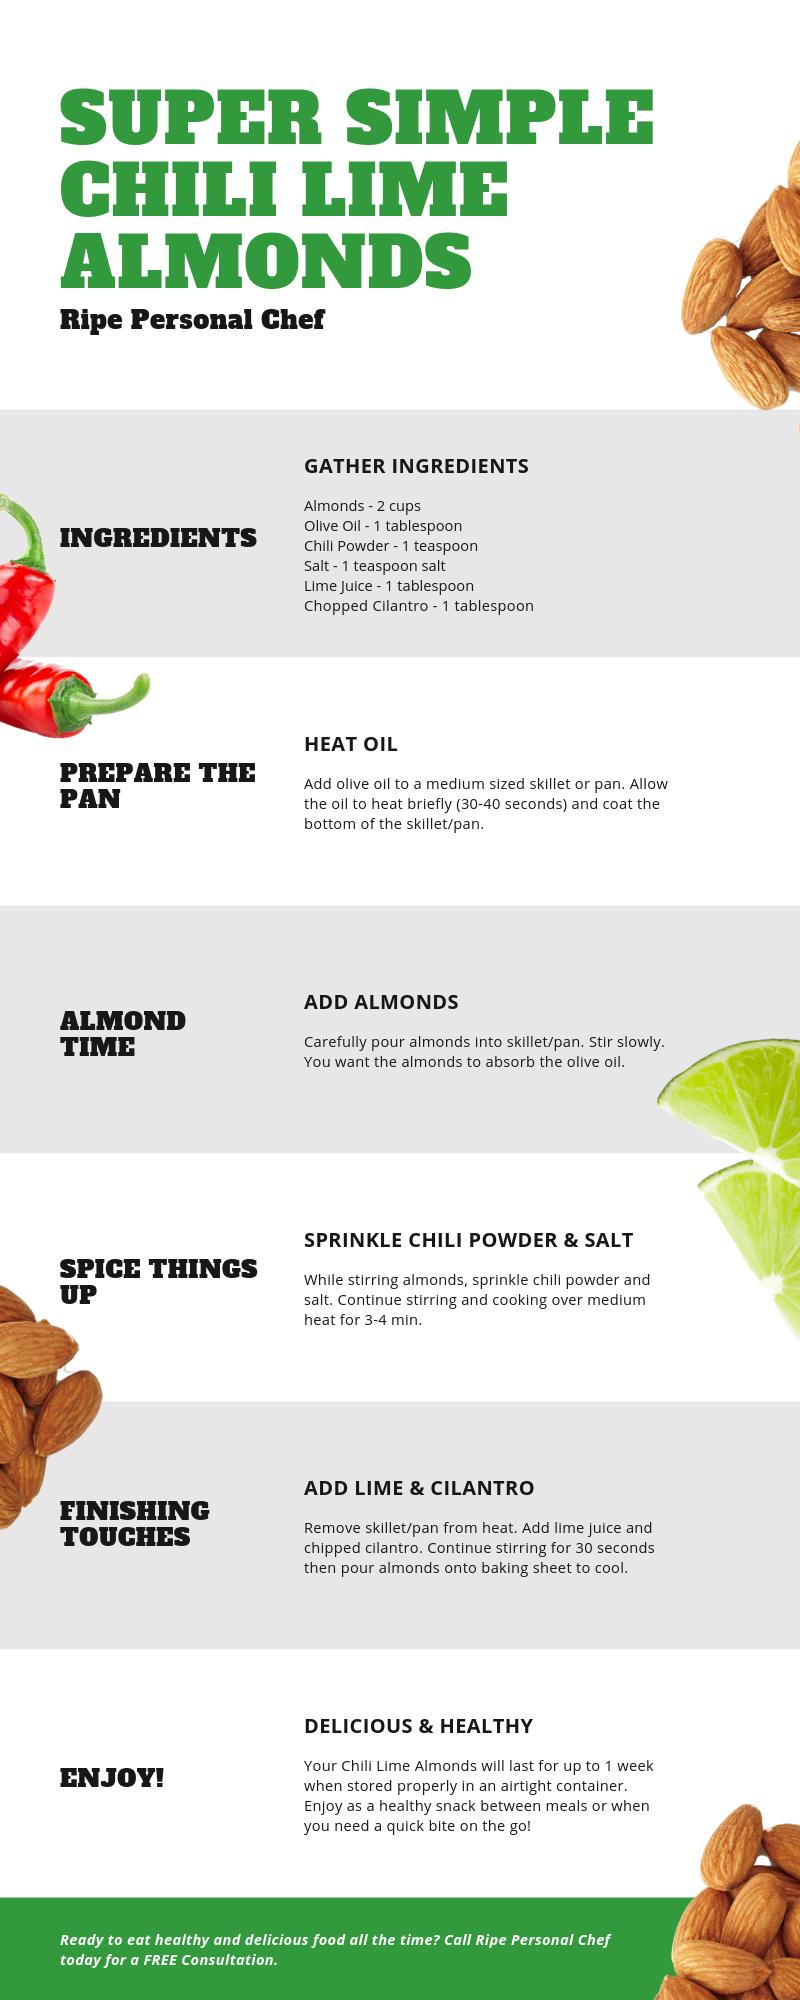 Simple chili lime almond recipe.